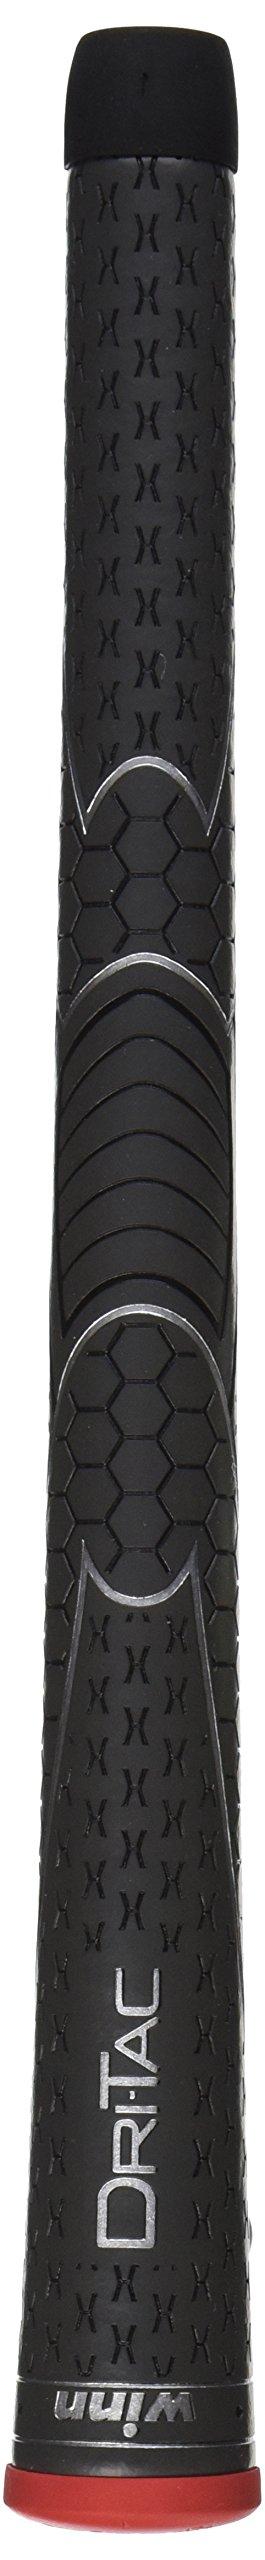 Winn DriTac Standard Midsize Grip (+1/16), Dark Gray